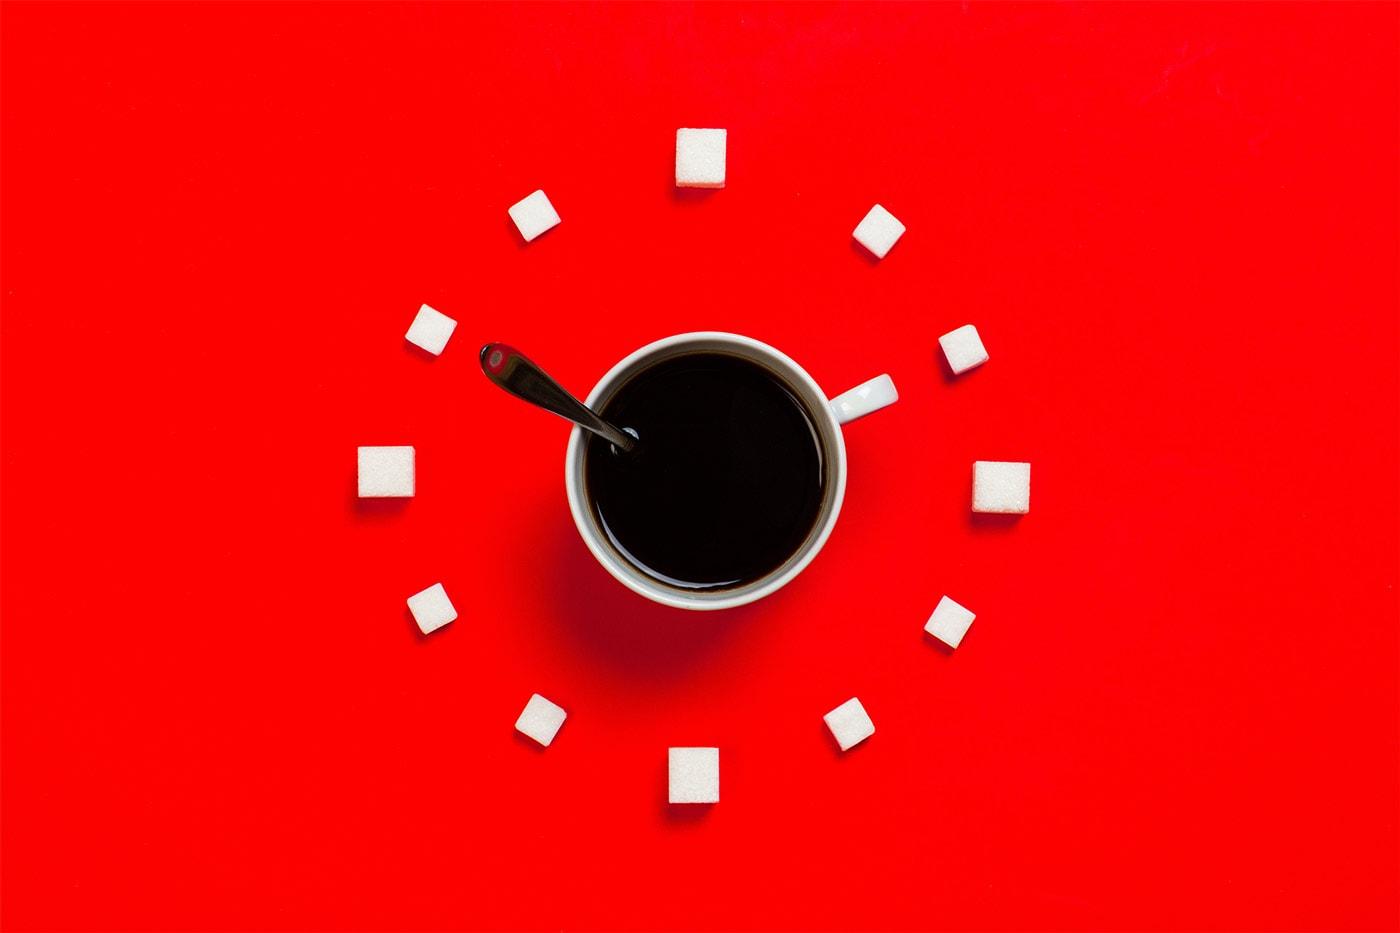 Cafe Design & Branding